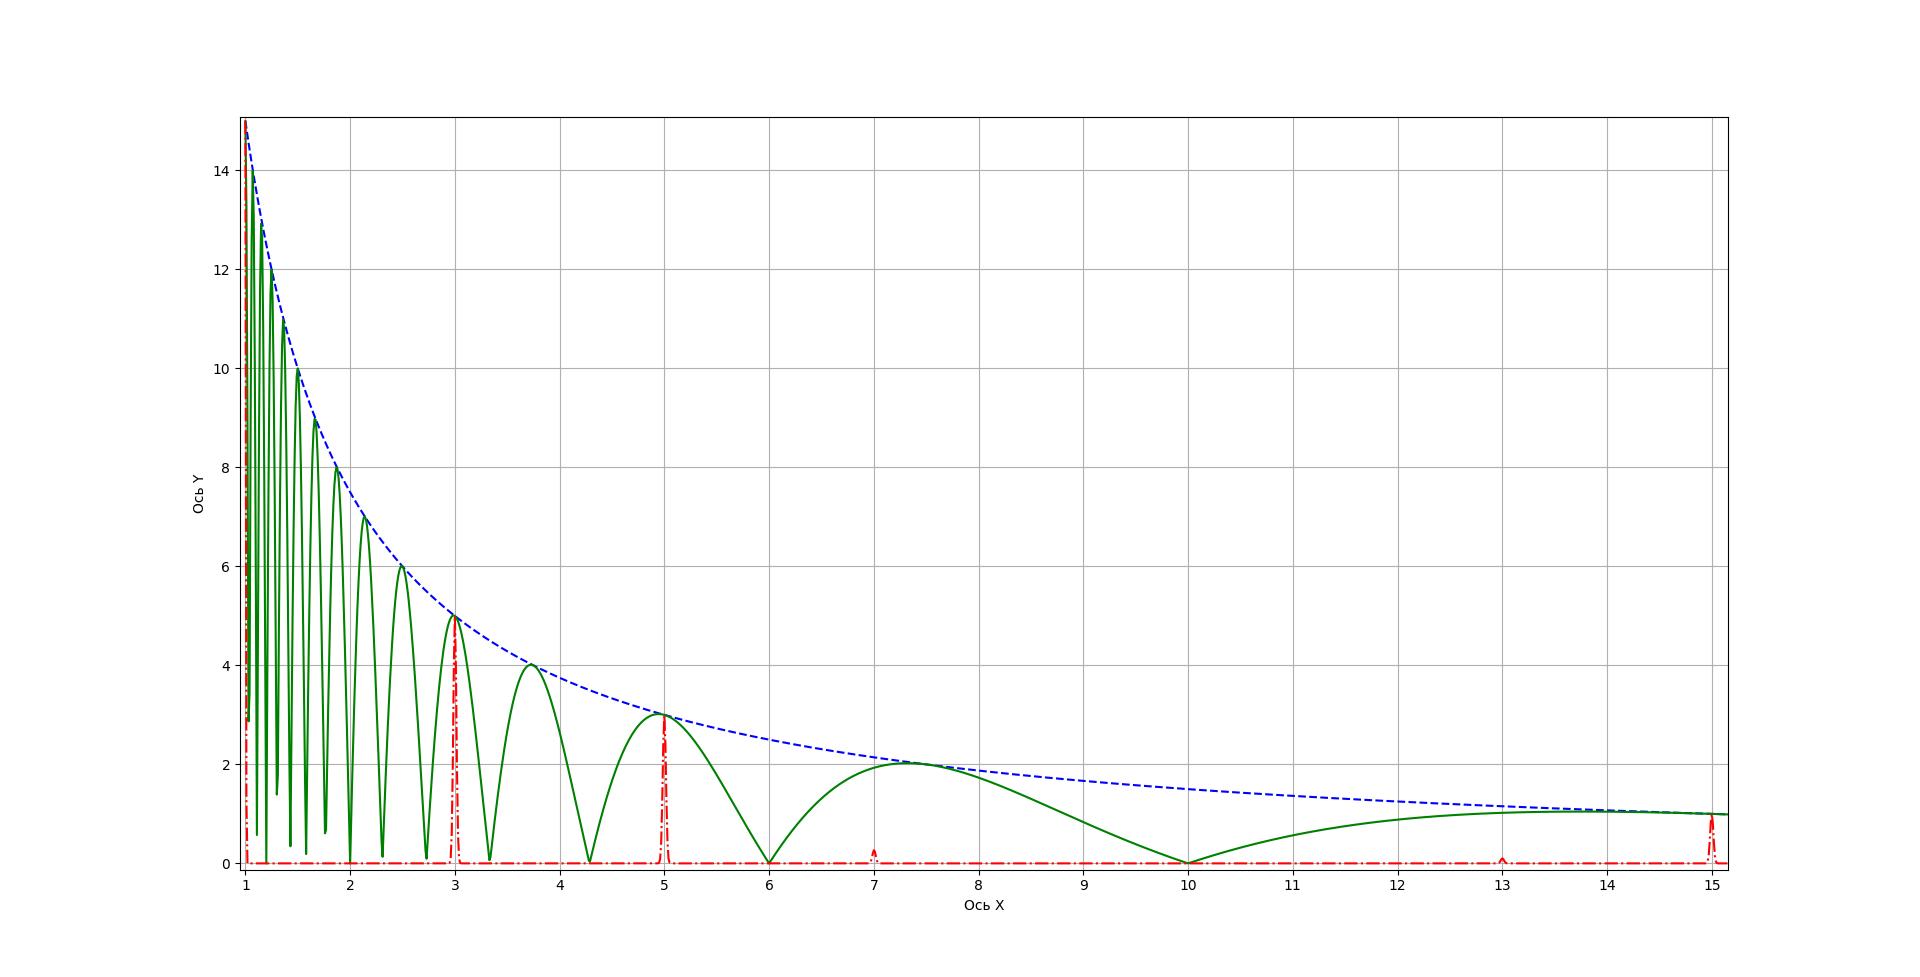 Рисунок 3 - Фильтрация f(x)⋅cos[π⋅f(x)]^10 с помощью sin(π⋅n⋅x/2)